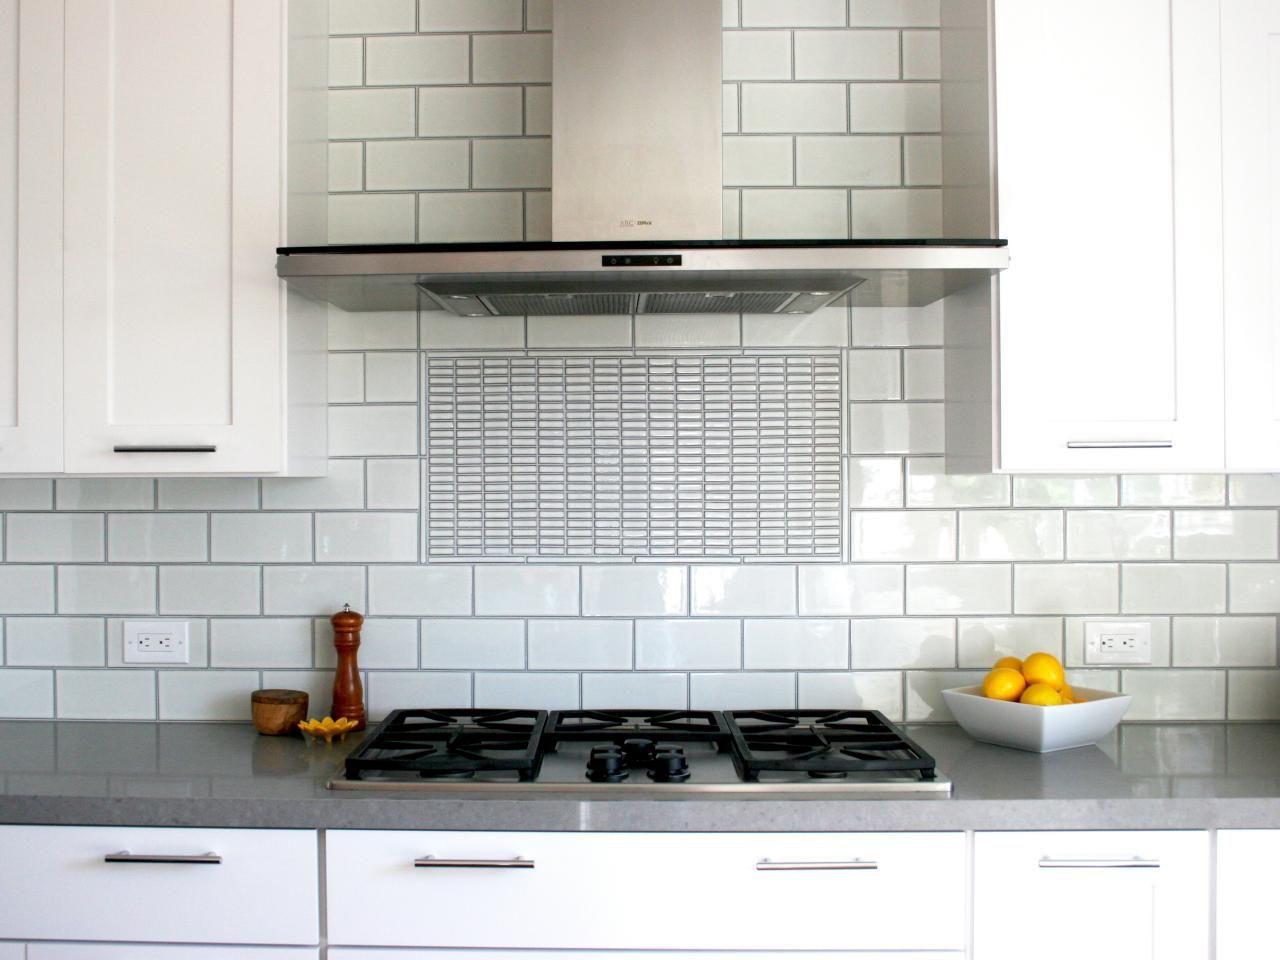 Pictures of Kitchen Backsplash Ideas From | Pinterest | Grey ...